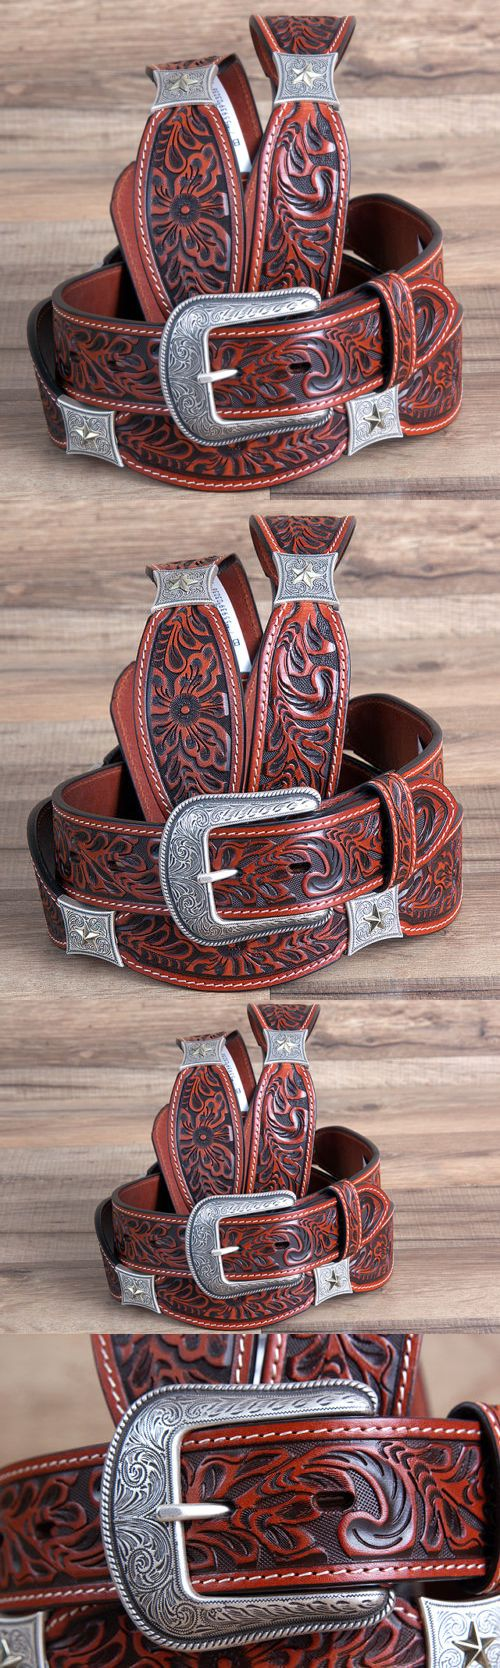 Baseball Belts 181334: 40 3D 1 3 4 Cognac Brown Floral Leather Mens Cowboy Western Fashion Belt -> BUY IT NOW ONLY: $54.99 on eBay!